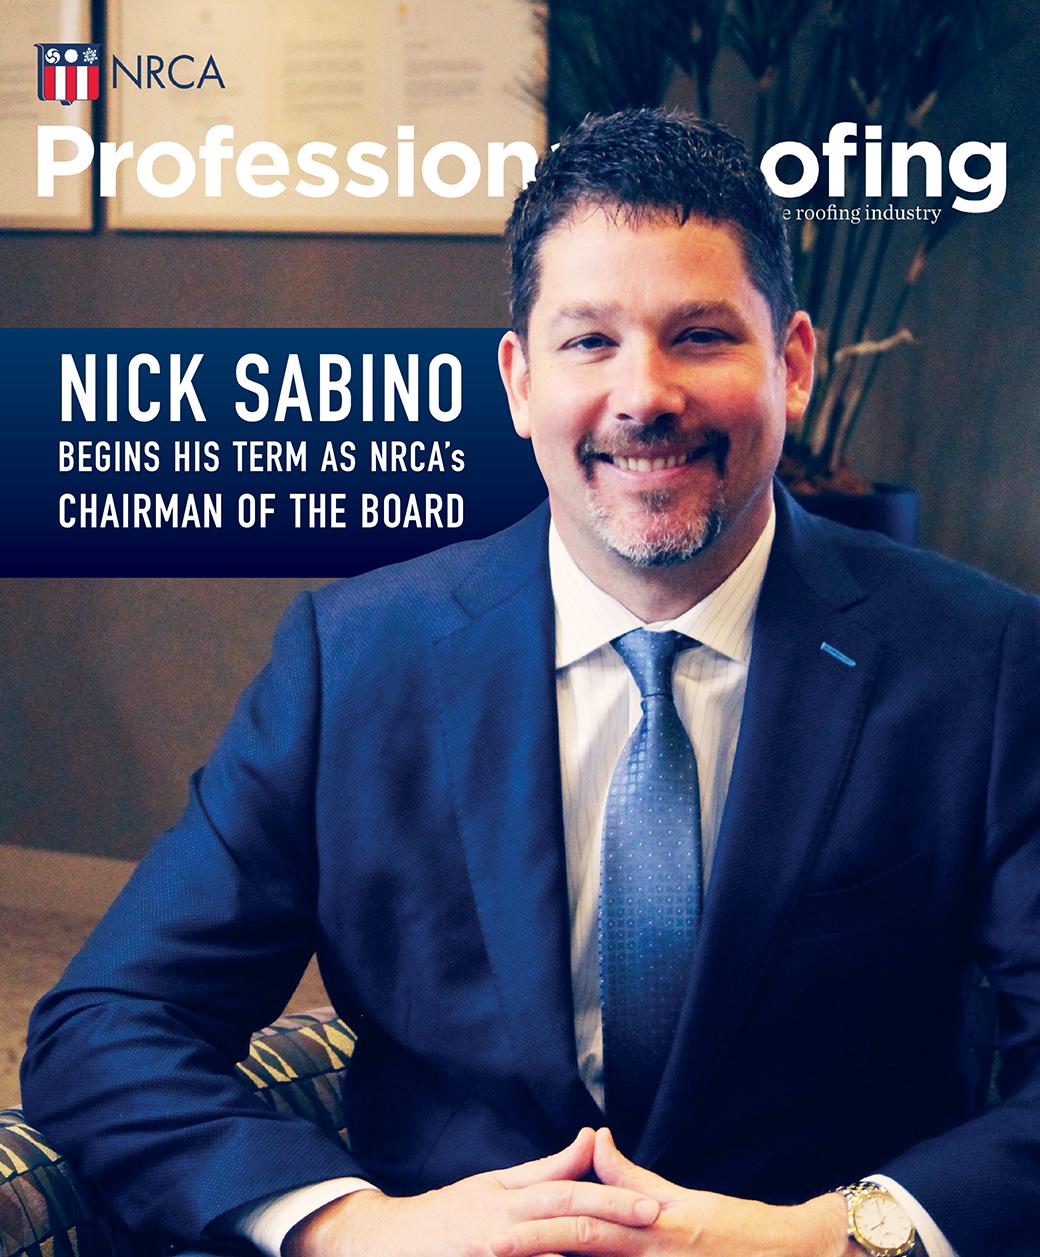 Professional Roofing Magazine 6/1/2019